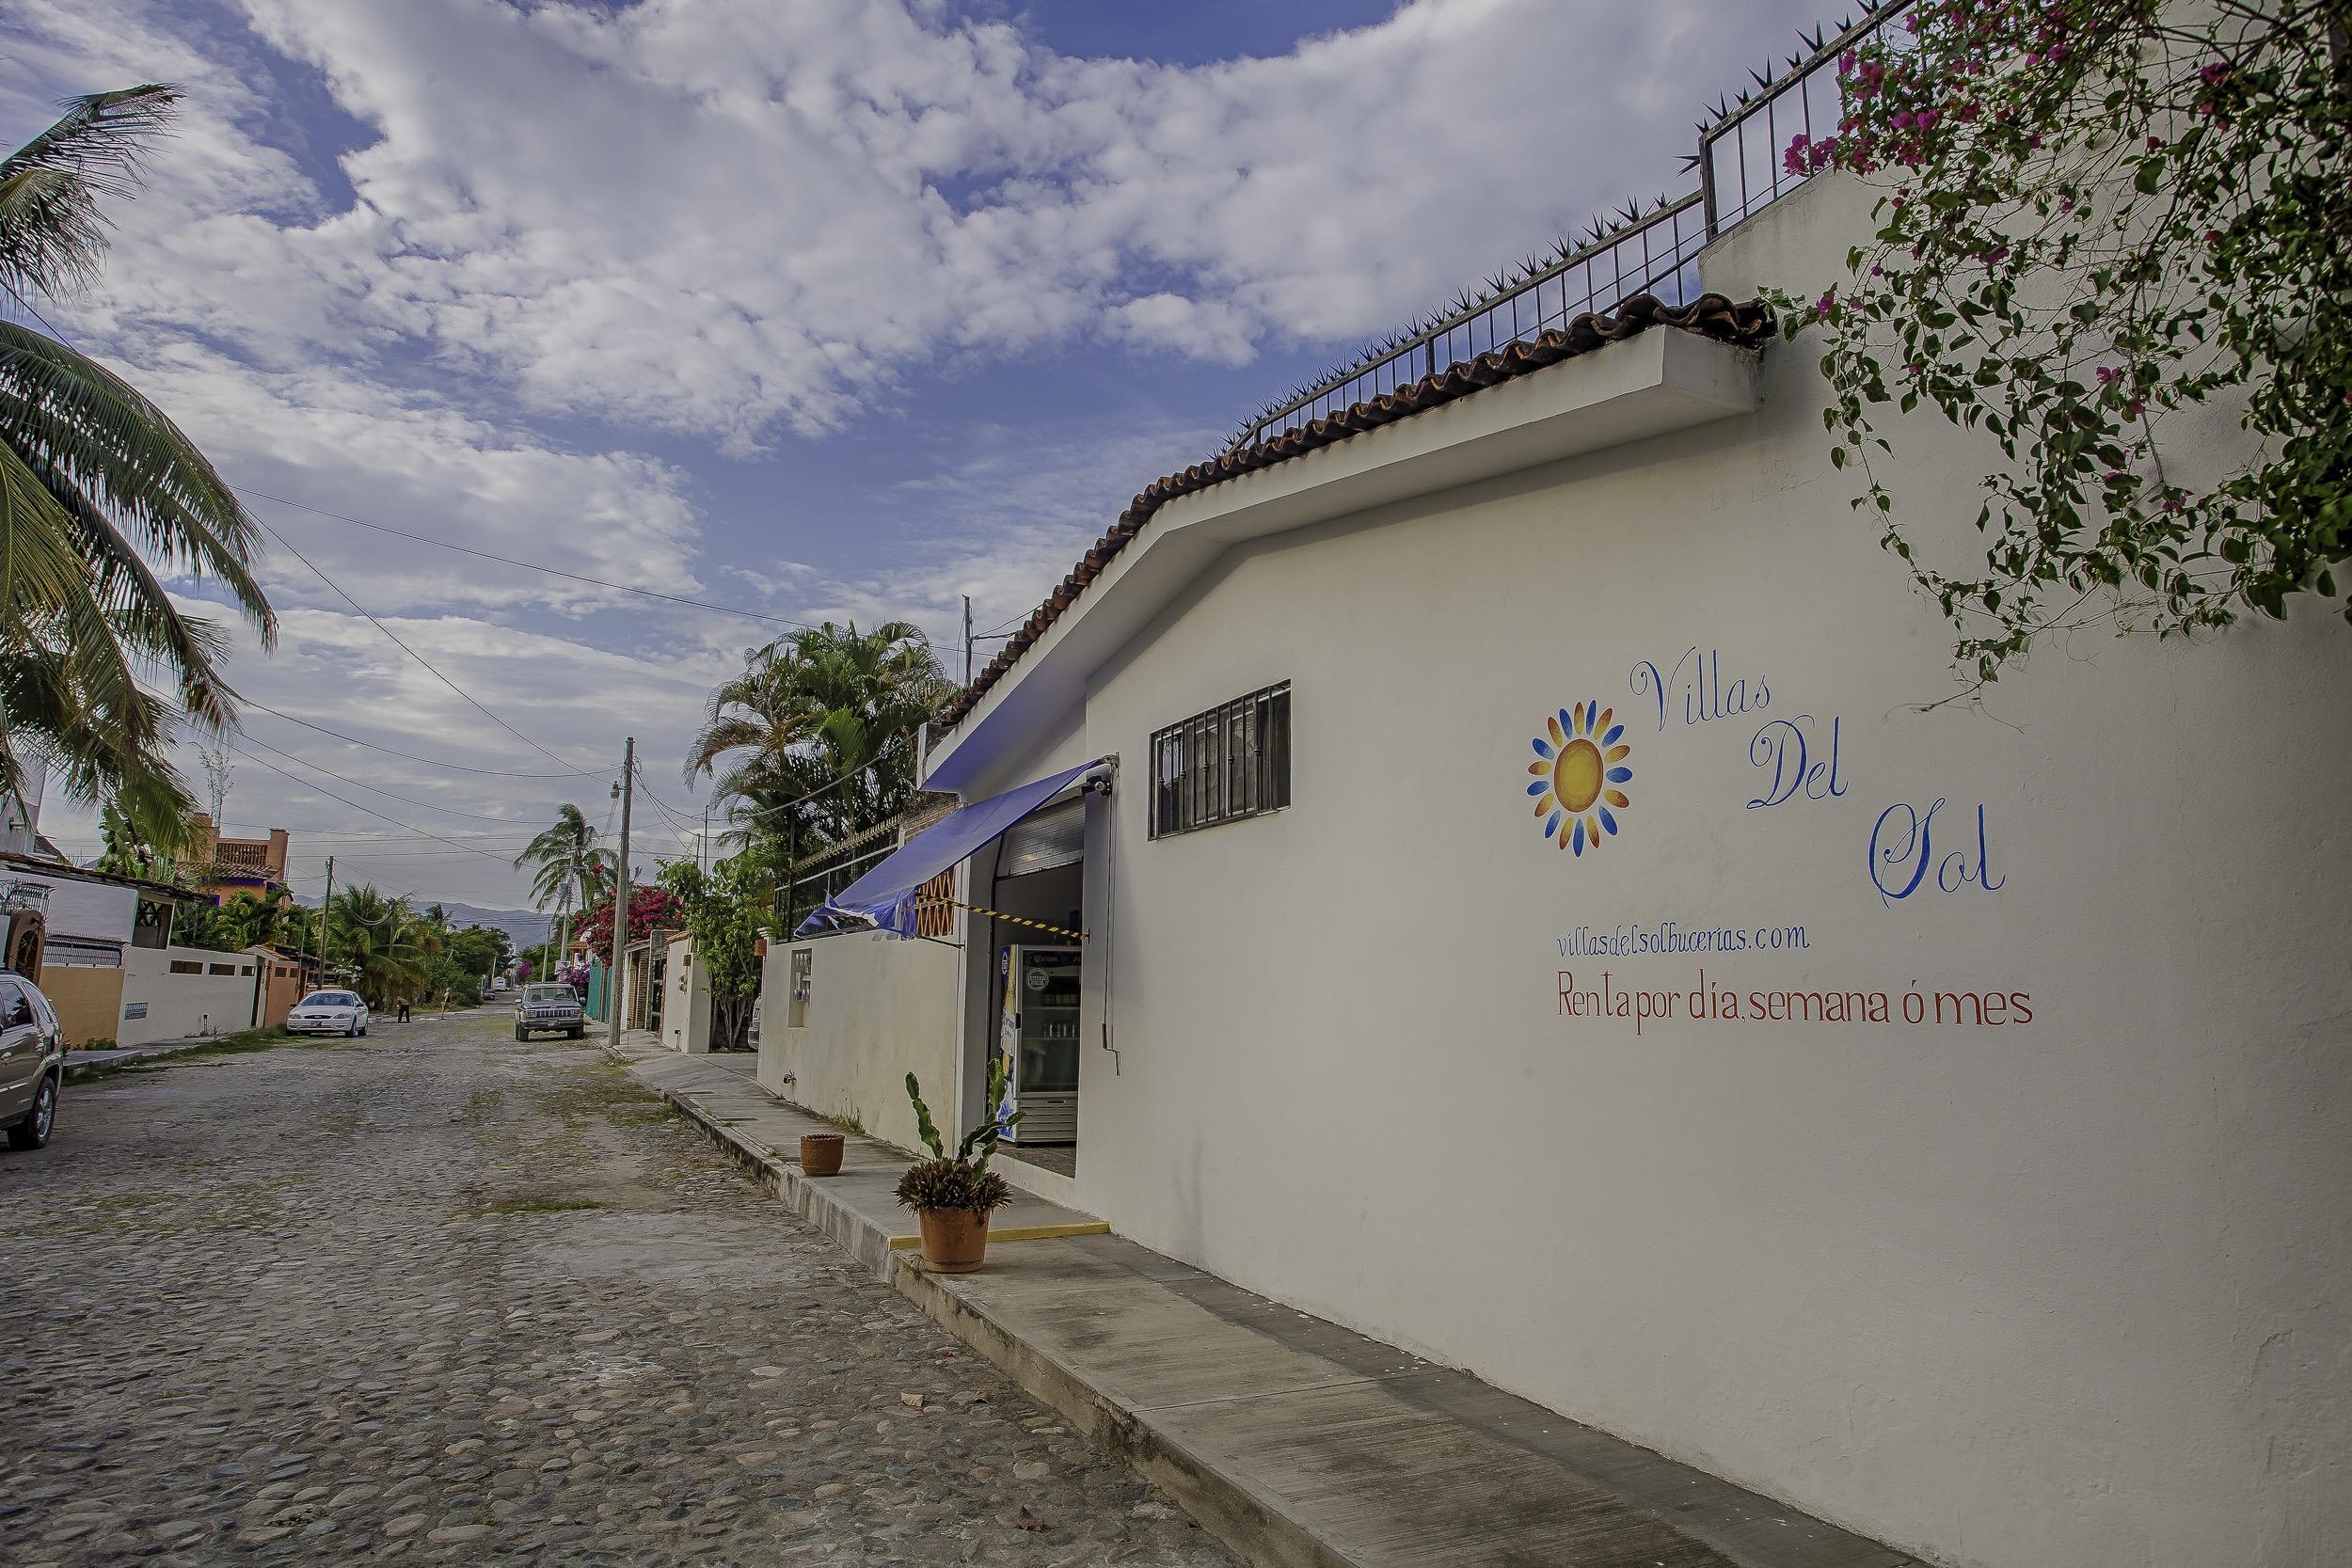 Villa Del Sol Hotel